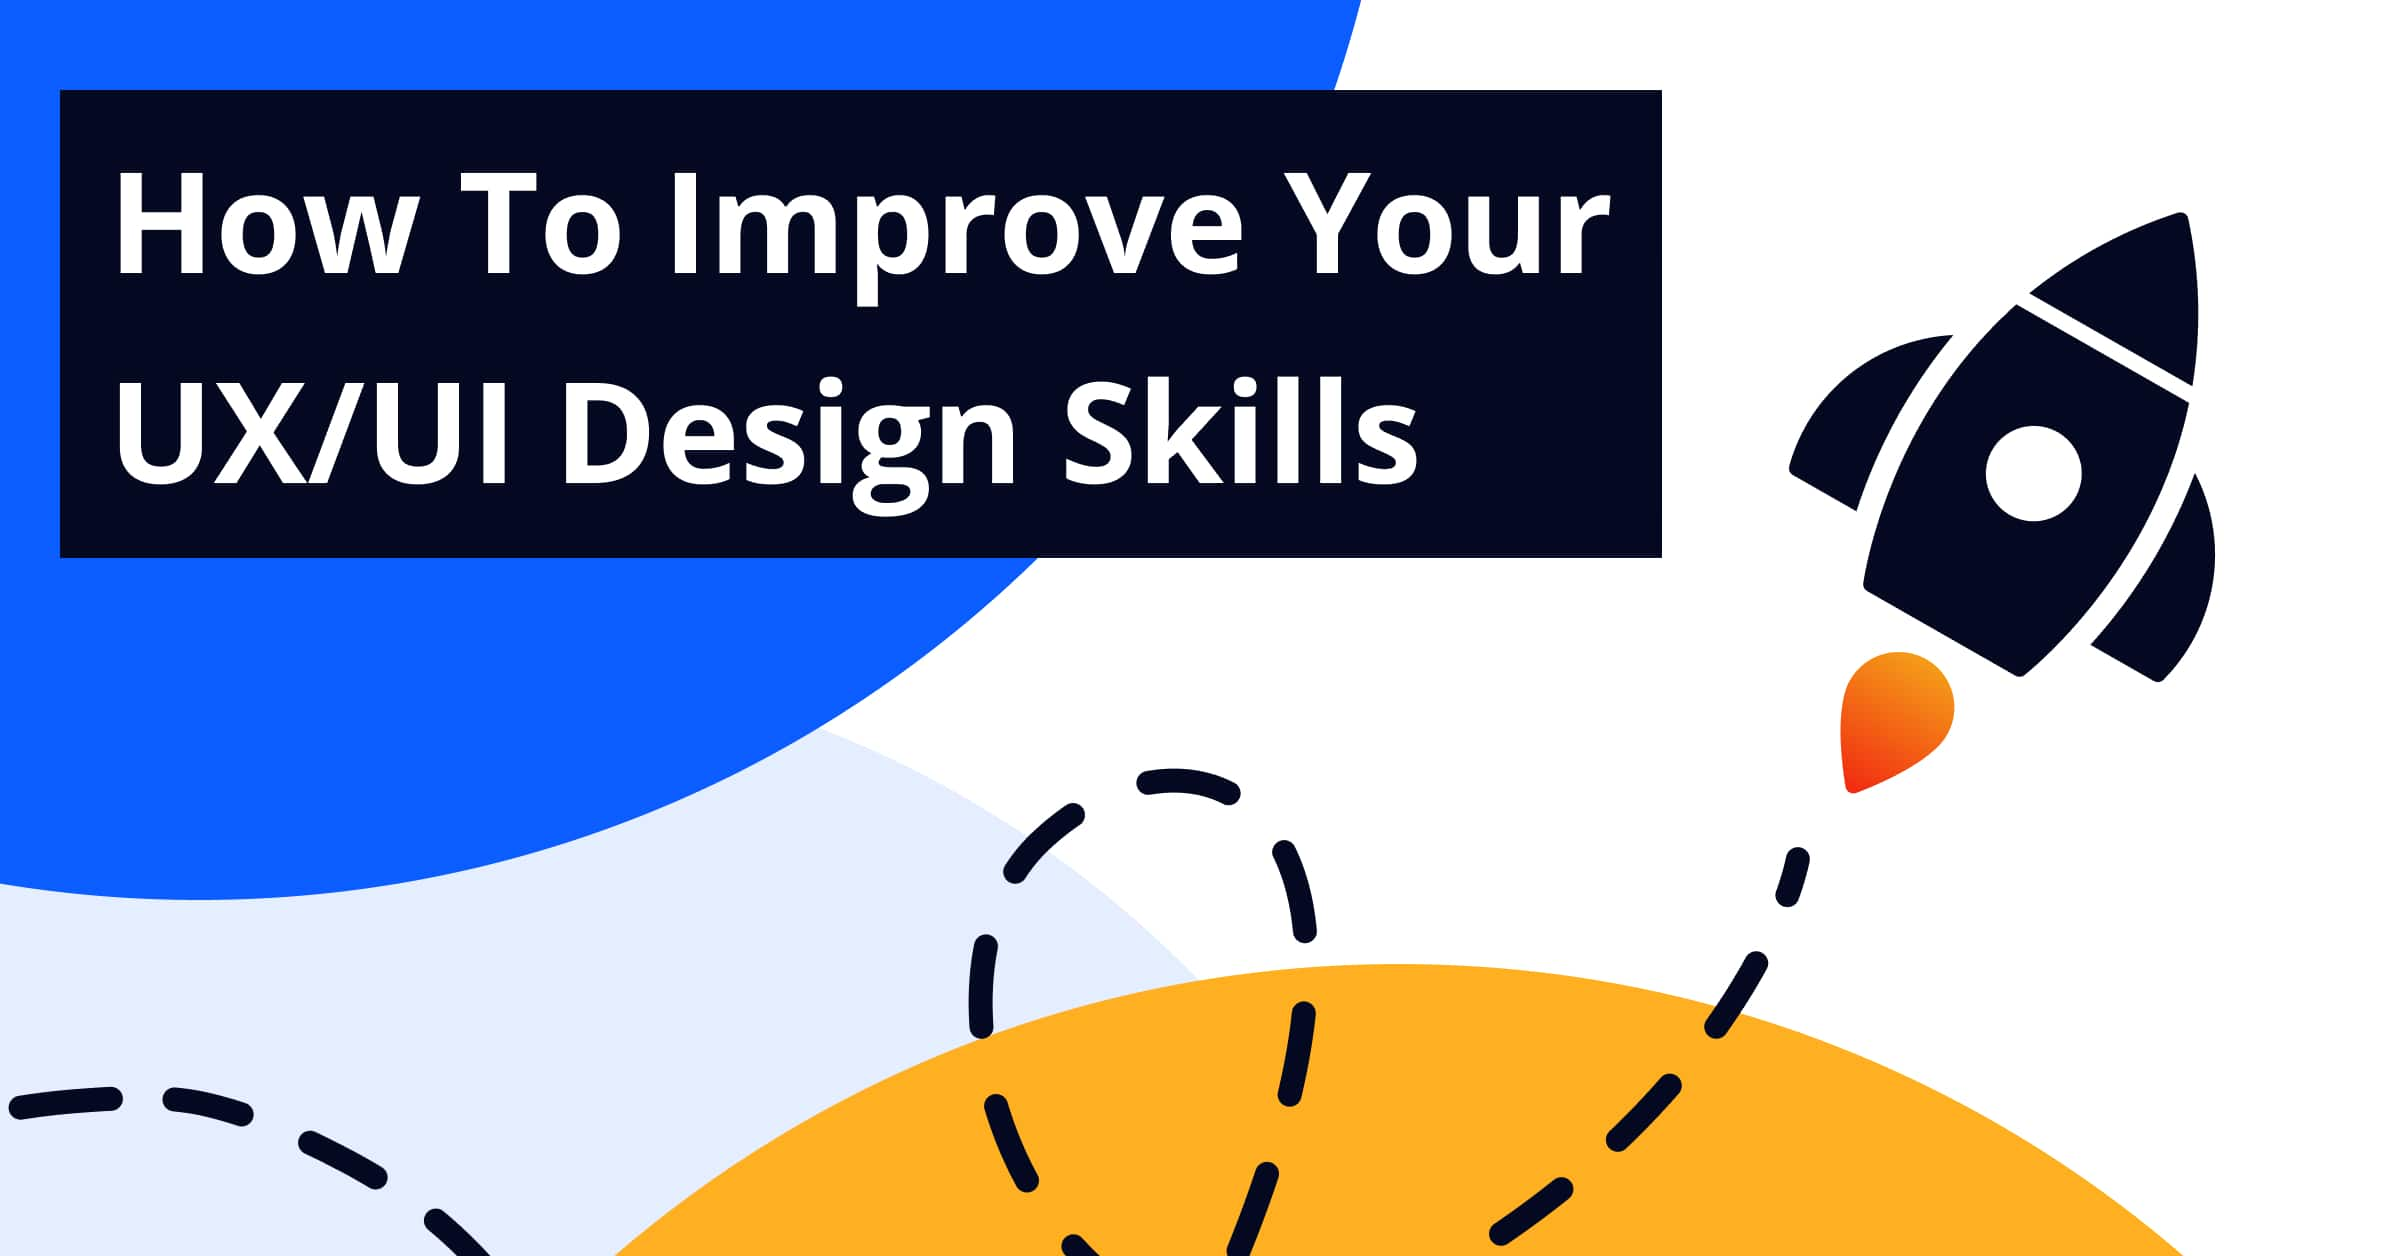 How to Improve Your UI/UX Design Skills